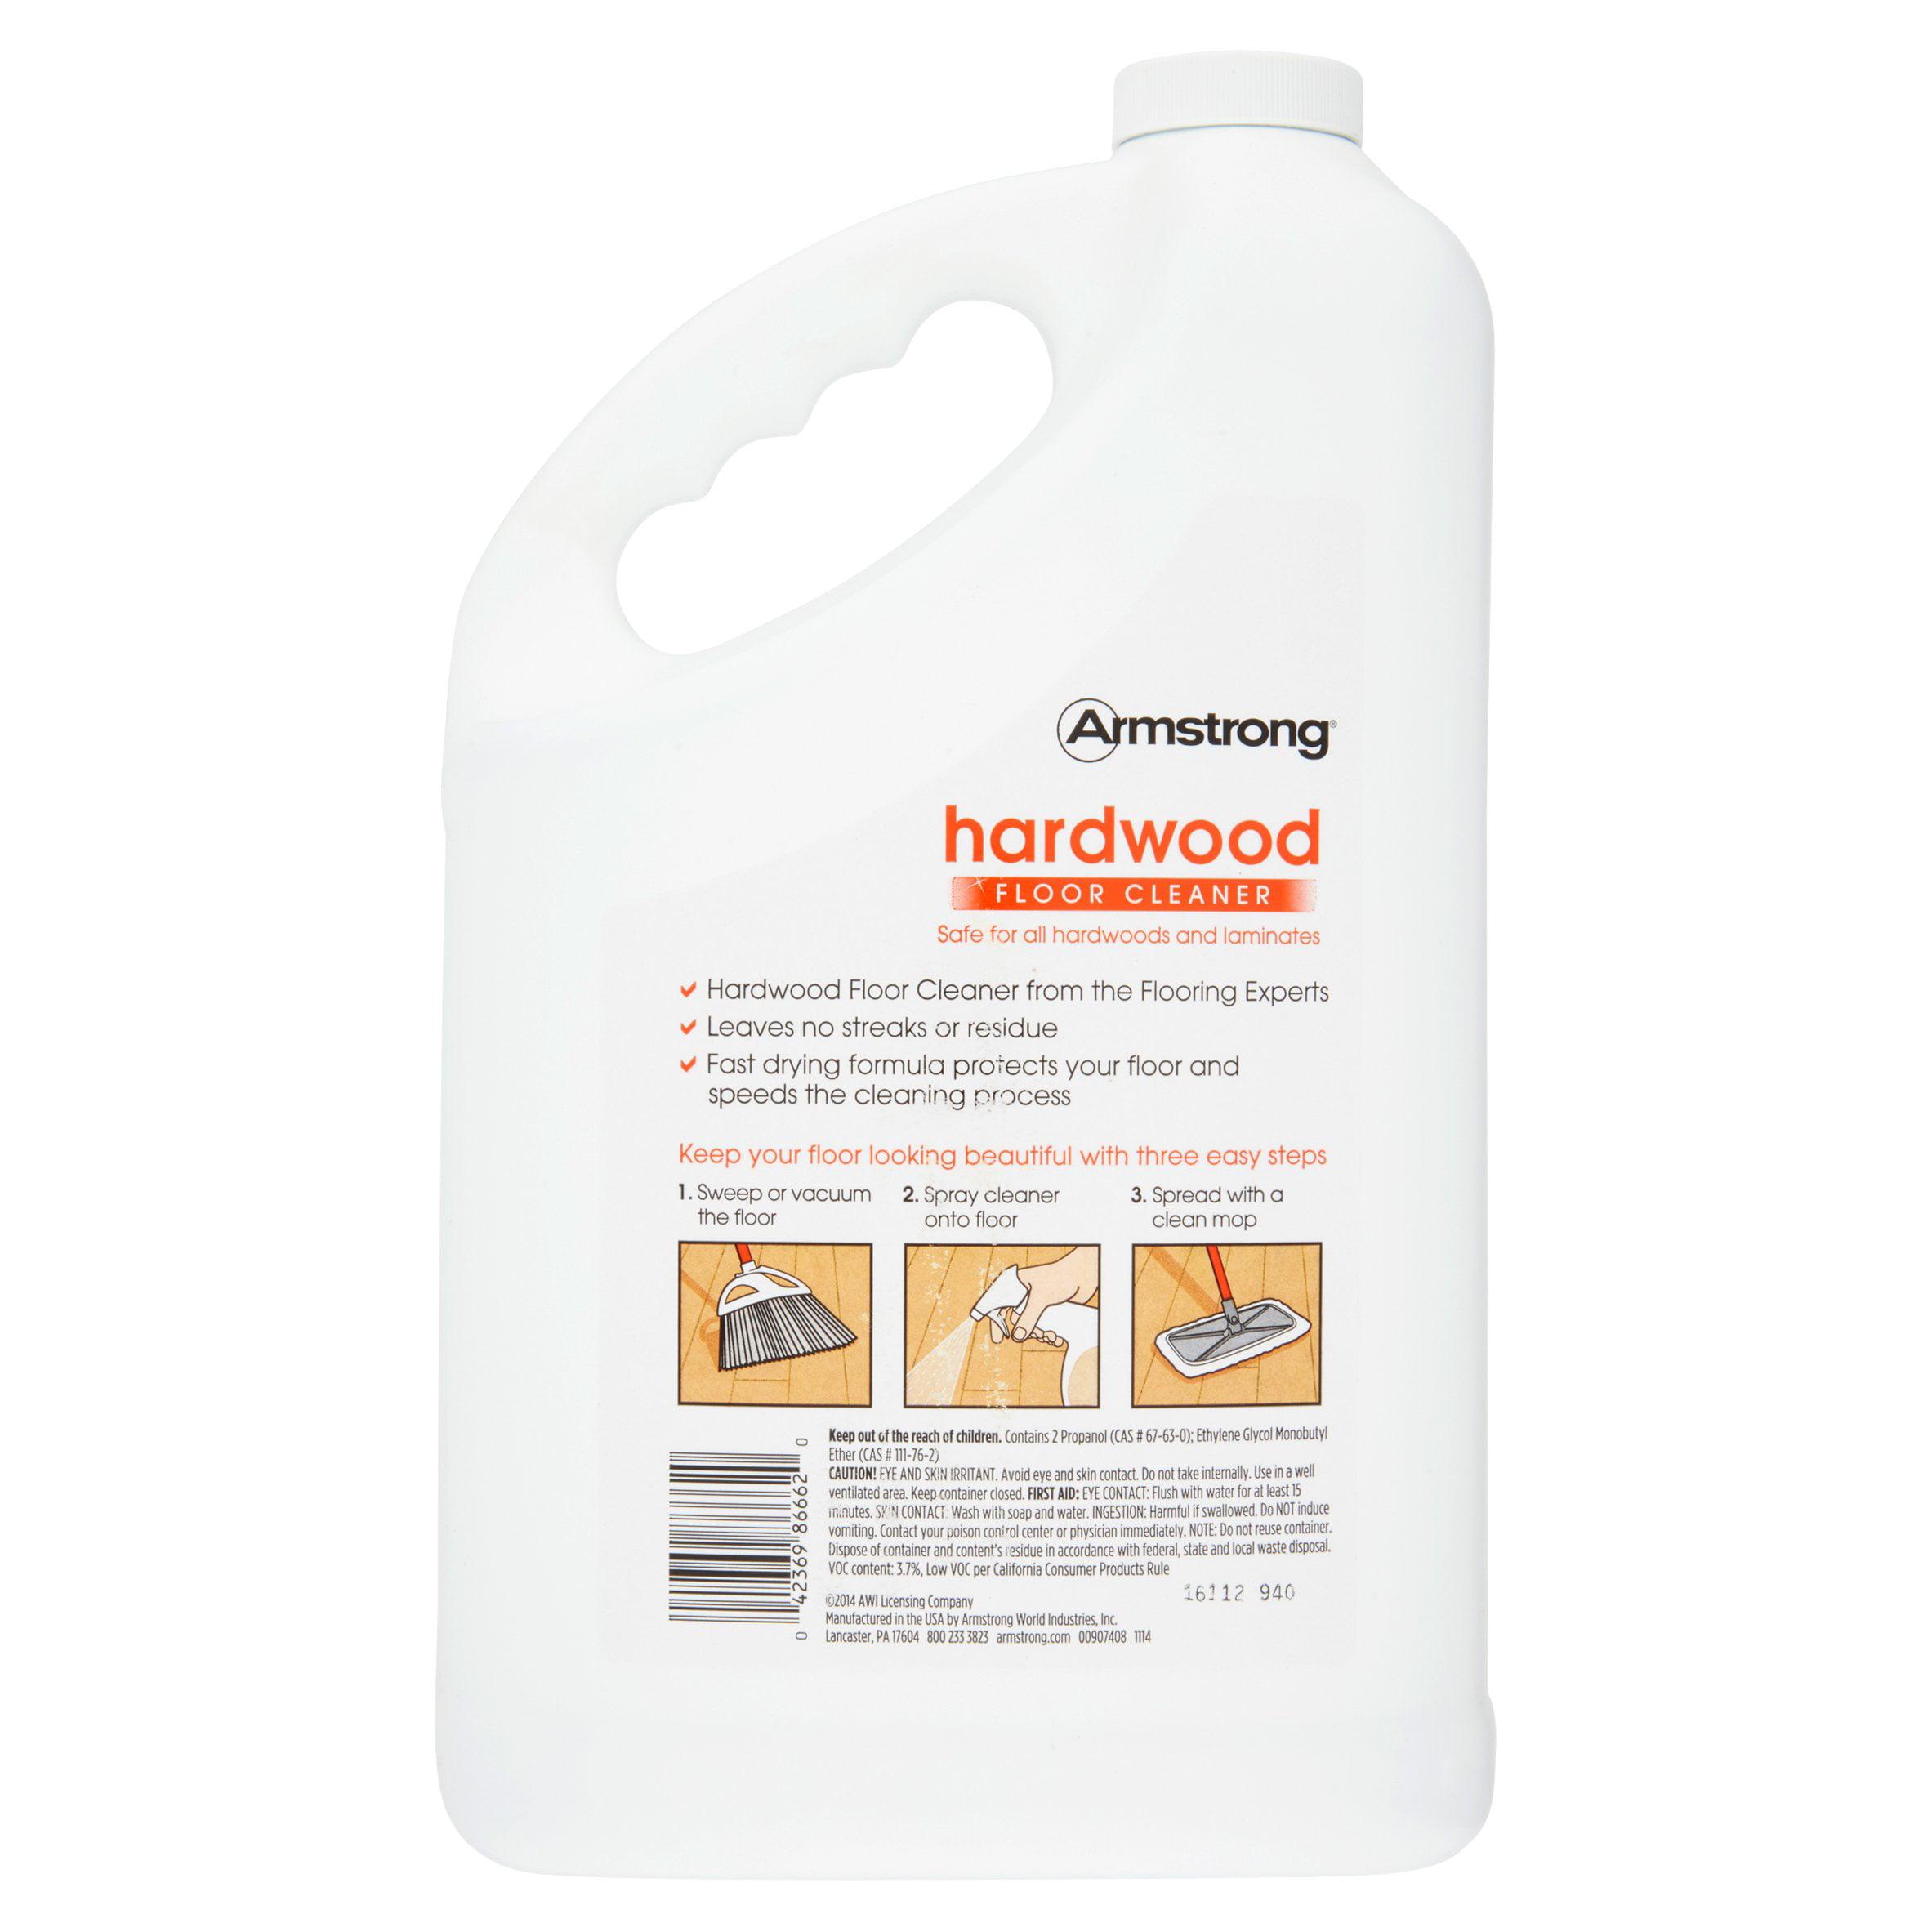 Armstrong Hardwood Citrus Fusion Floor Cleaner Refill, 128 Fl Oz    Walmart.com